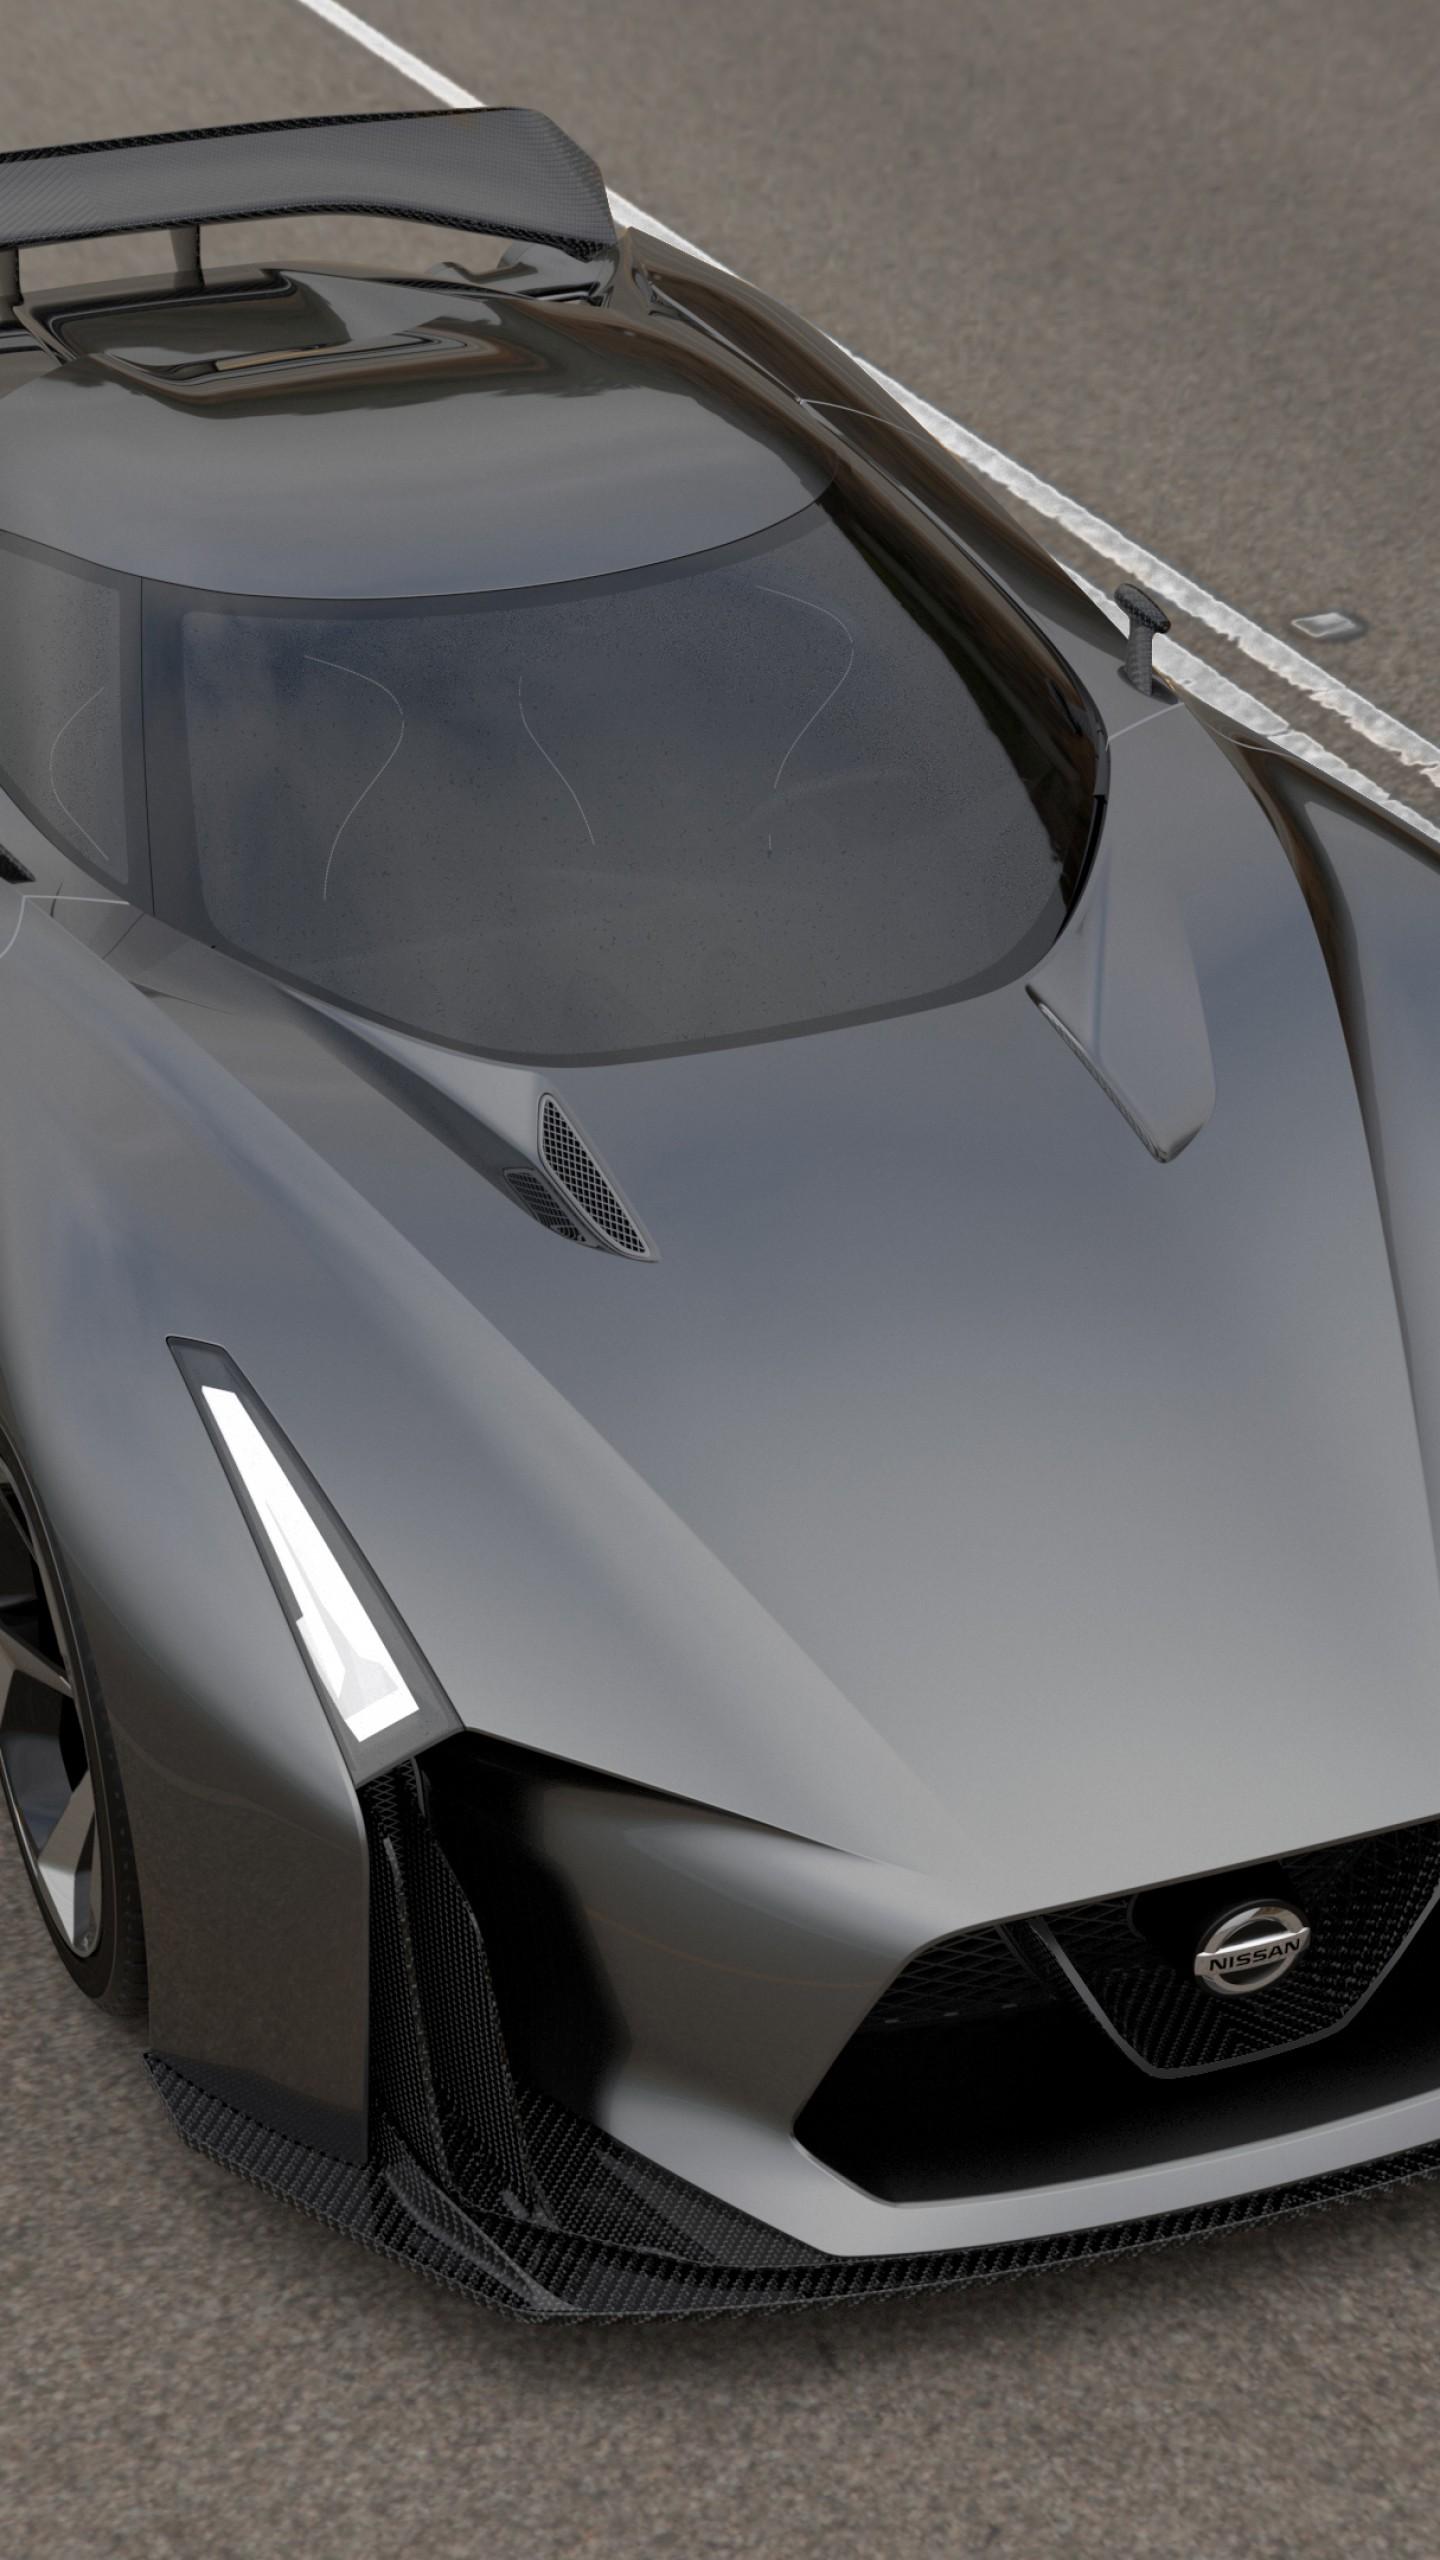 Wallpaper Nissan 2020 Vision Gran Turismo Concept Nissan